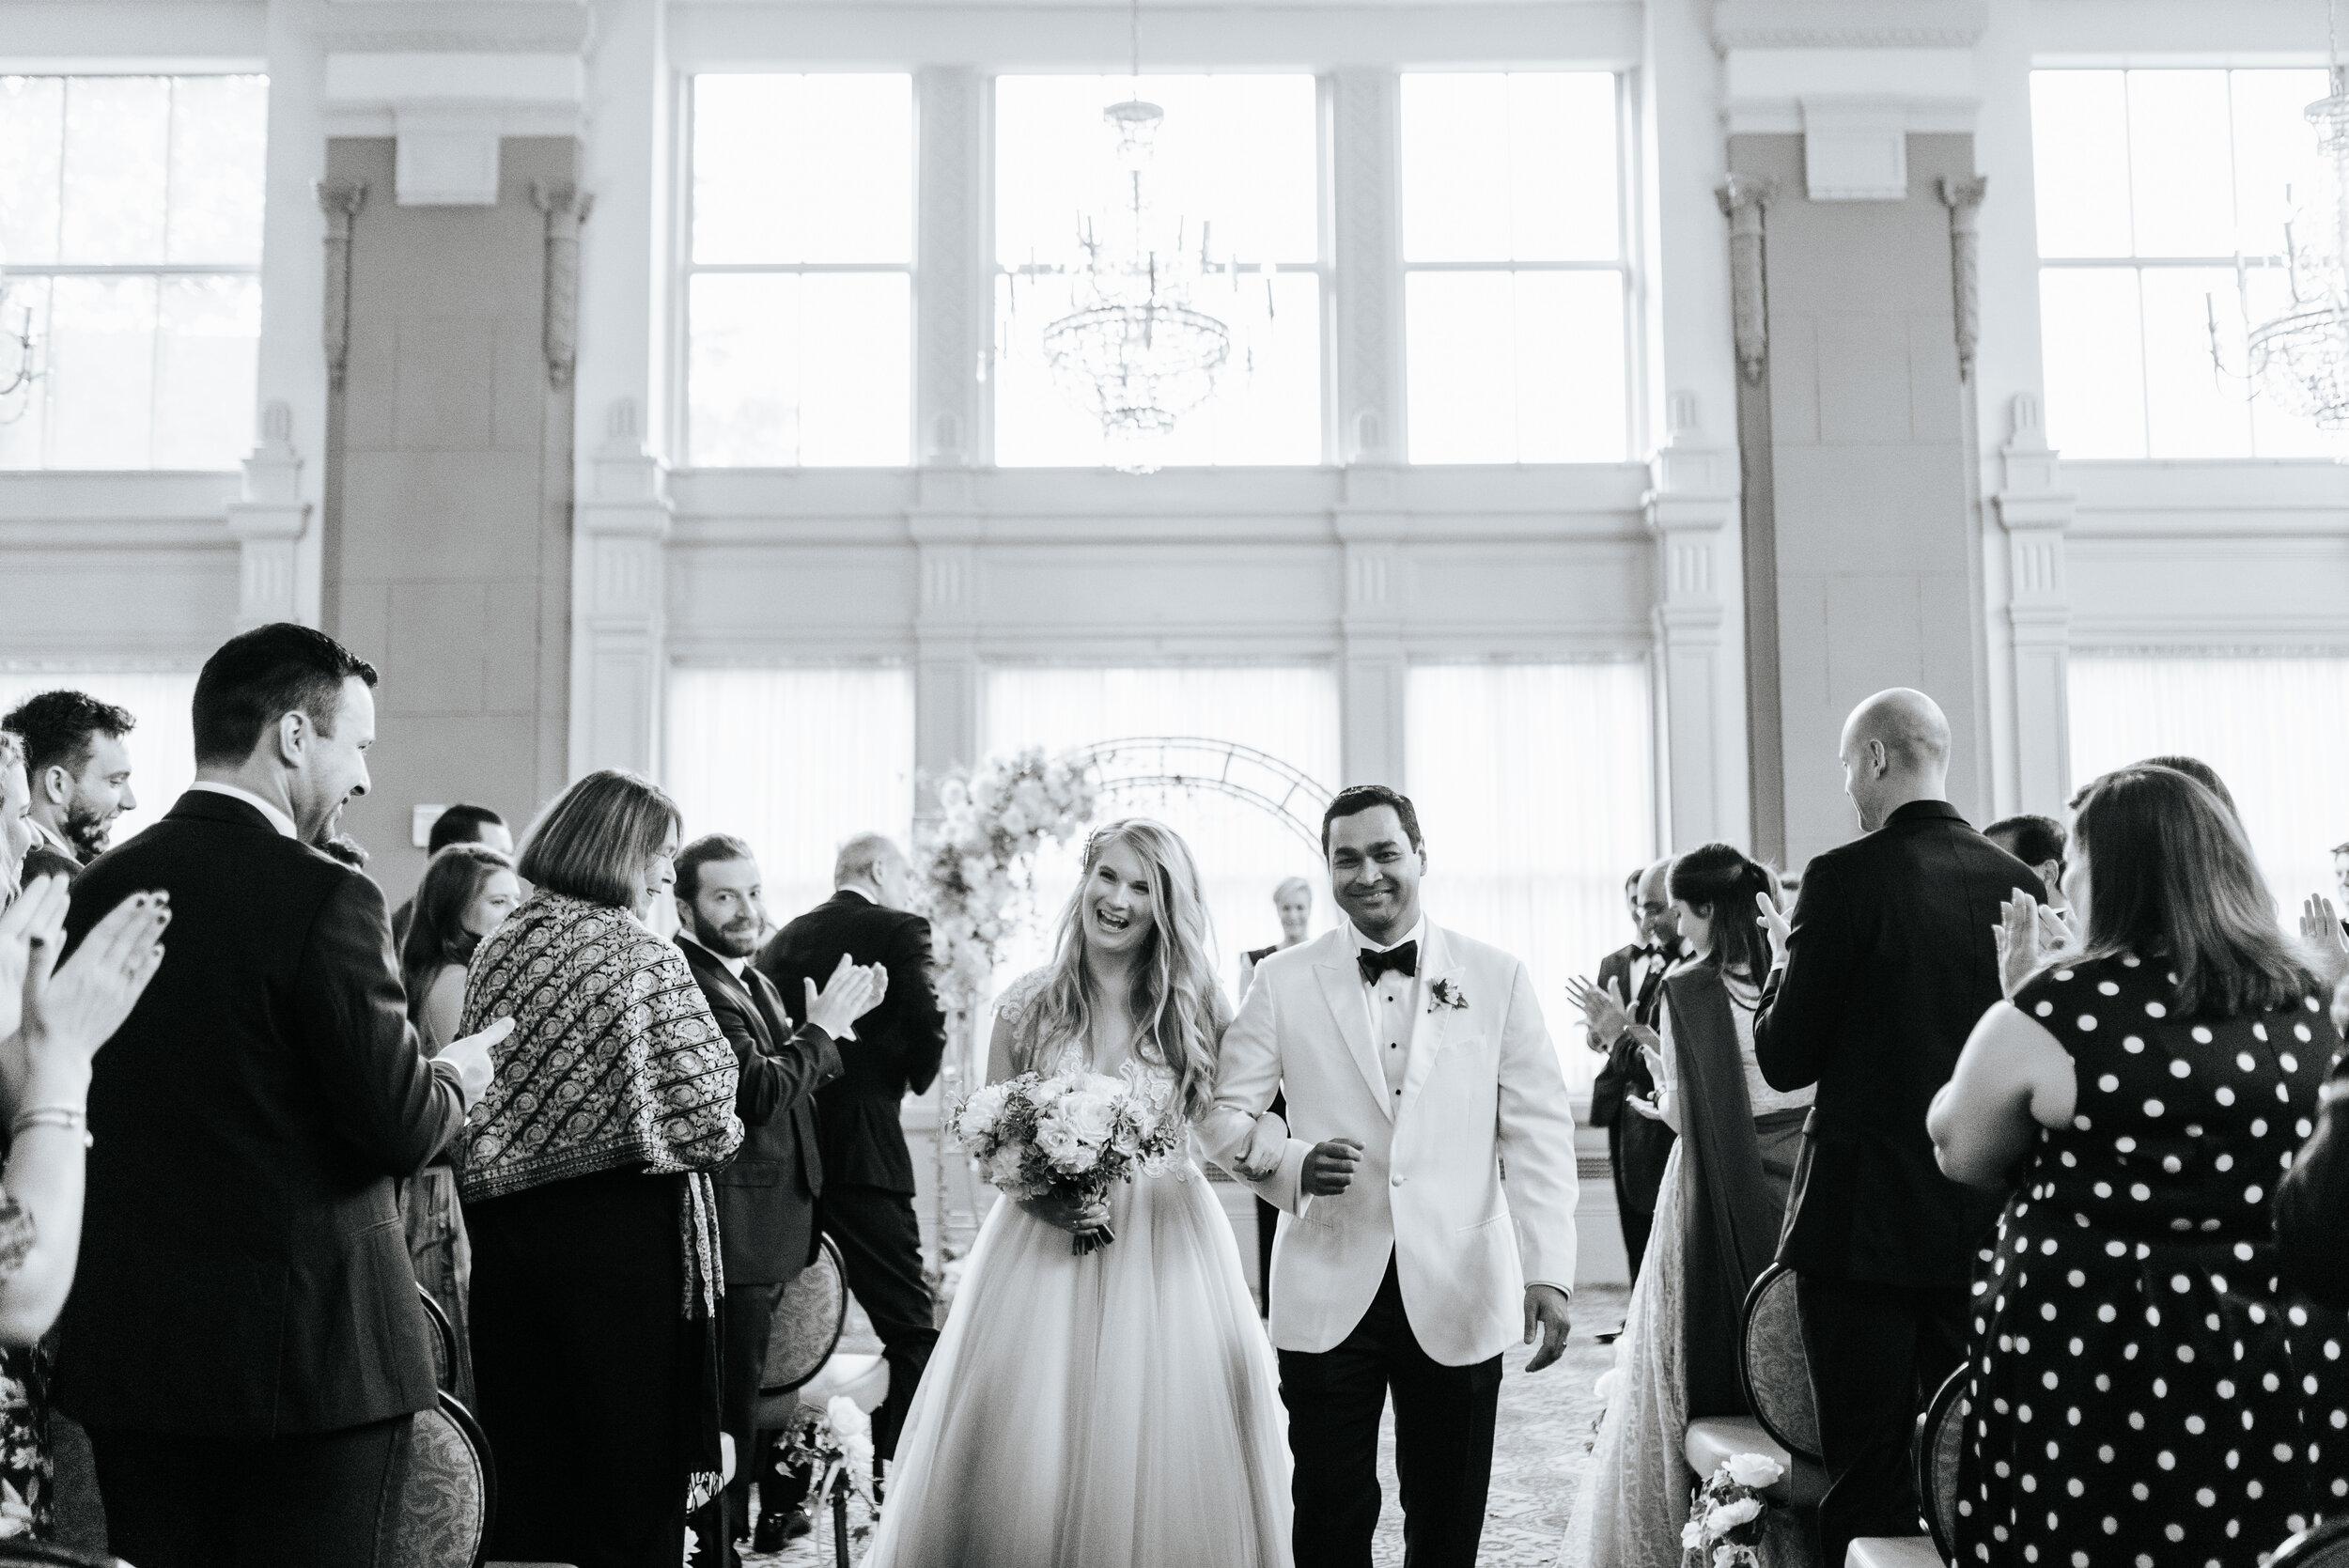 Cassie-Mrunal-Wedding-Quirk-Hotel-John-Marshall-Ballrooms-Richmond-Virginia-Photography-by-V-80.jpg